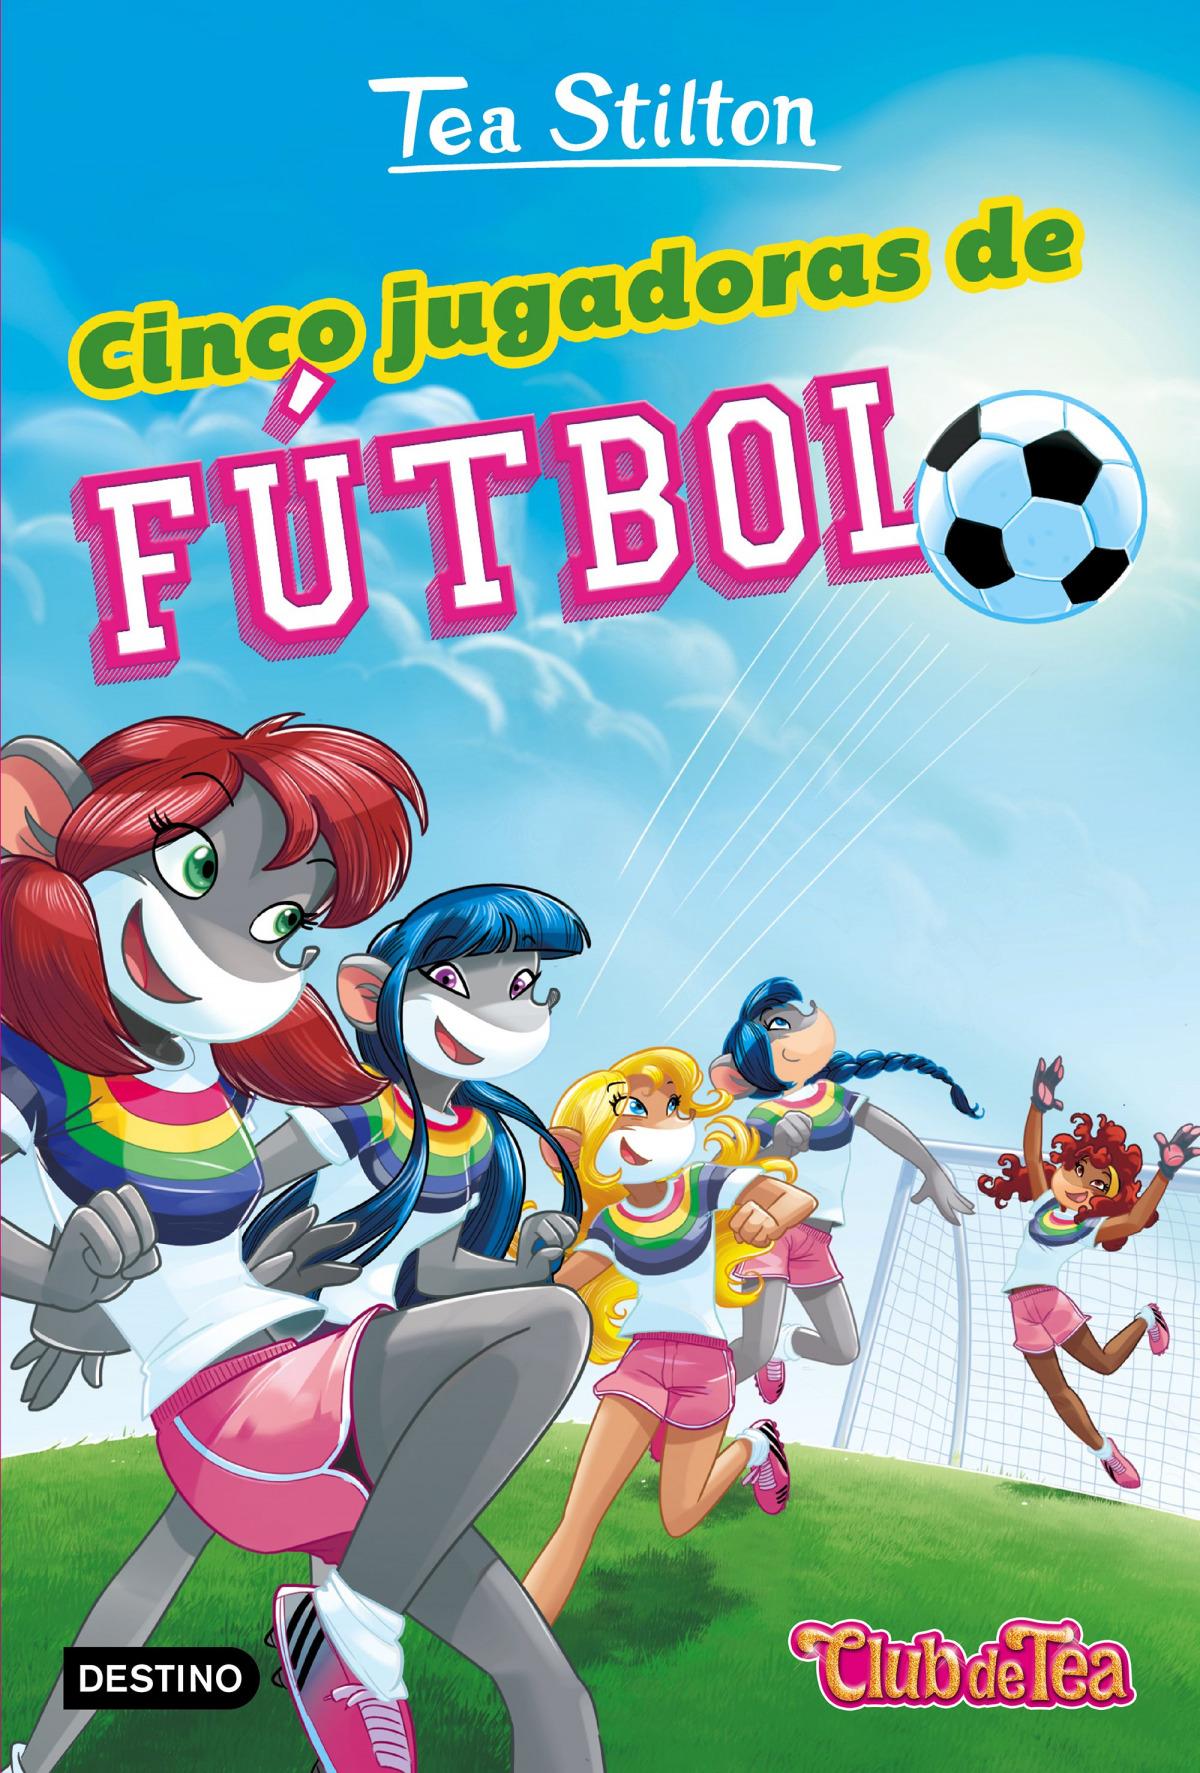 TEA STILTON CINCO JUGADORAS DE FUTBOL